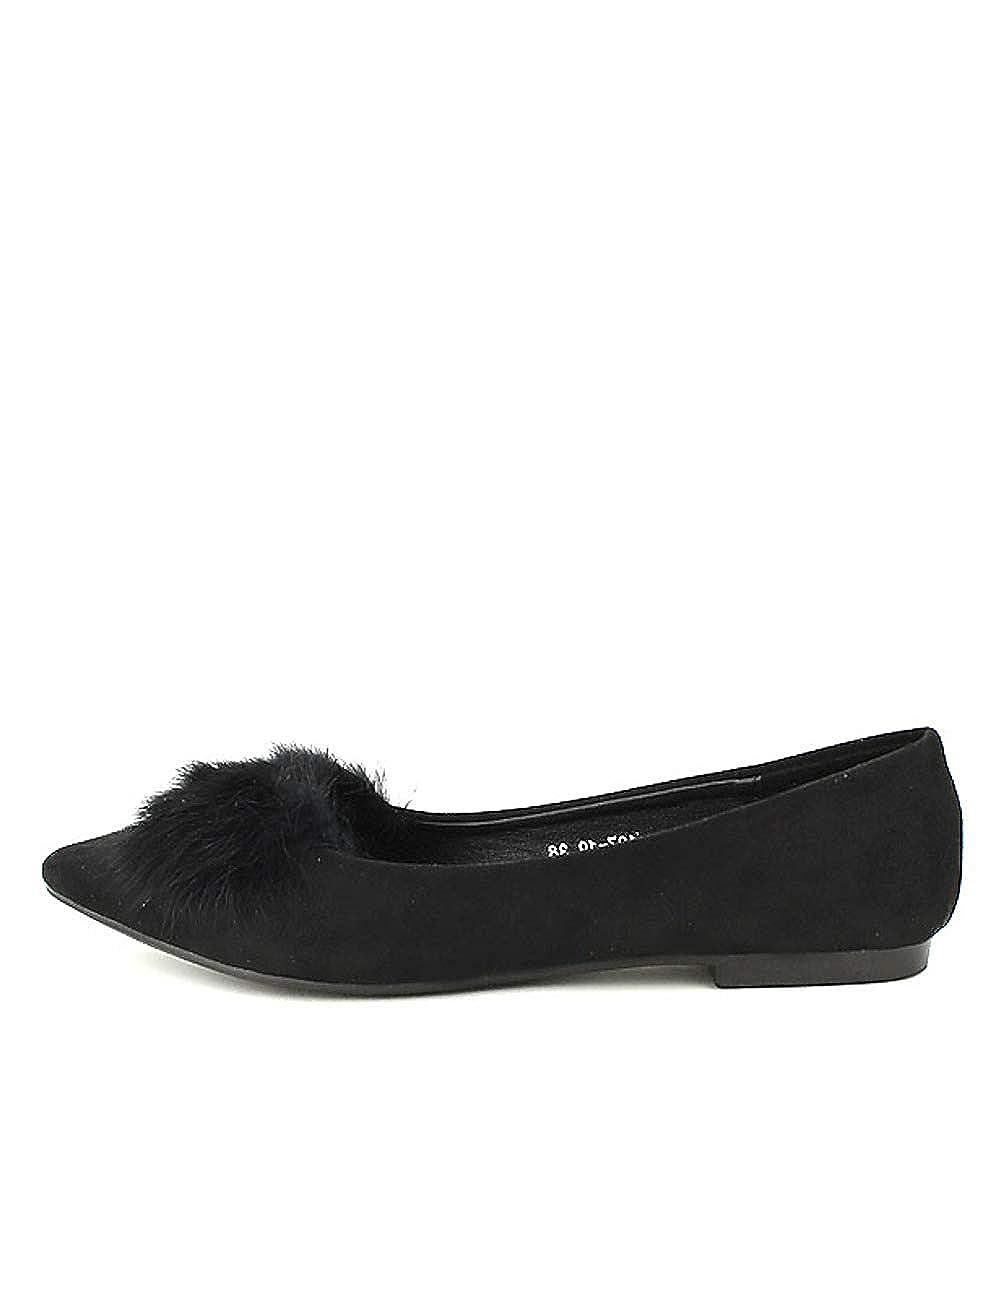 Cendriyon, 19183 Ballerines Noires MULANKA Fourrure Chaussures Femme Chaussures MULANKA Noir 413181f - deadsea.space